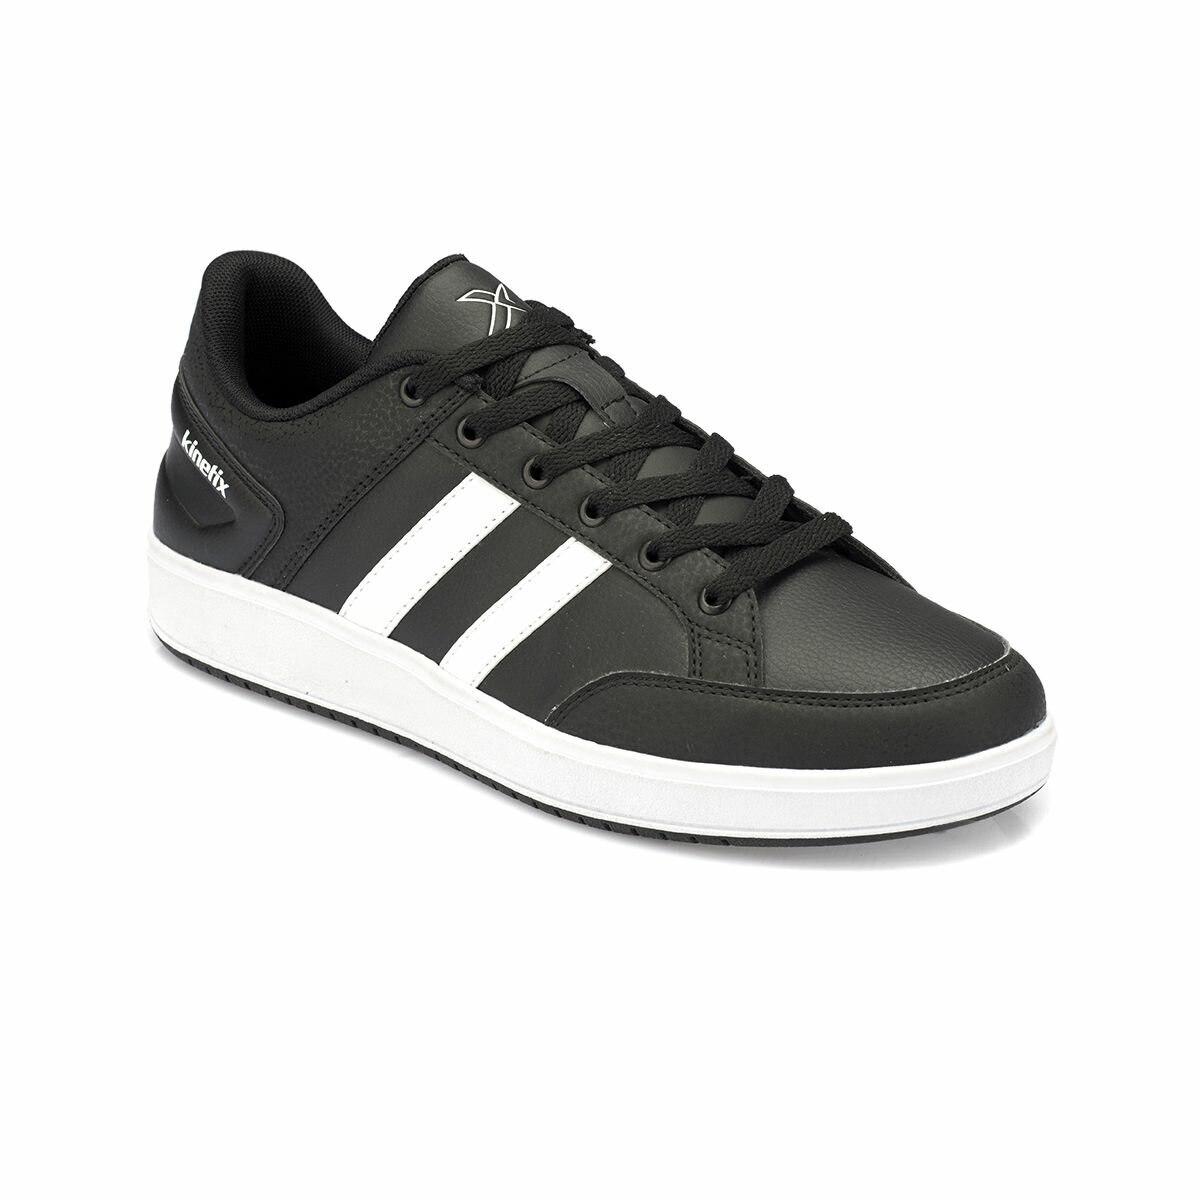 FLO KORT M Black Men 'S Sneaker Shoes KINETIX